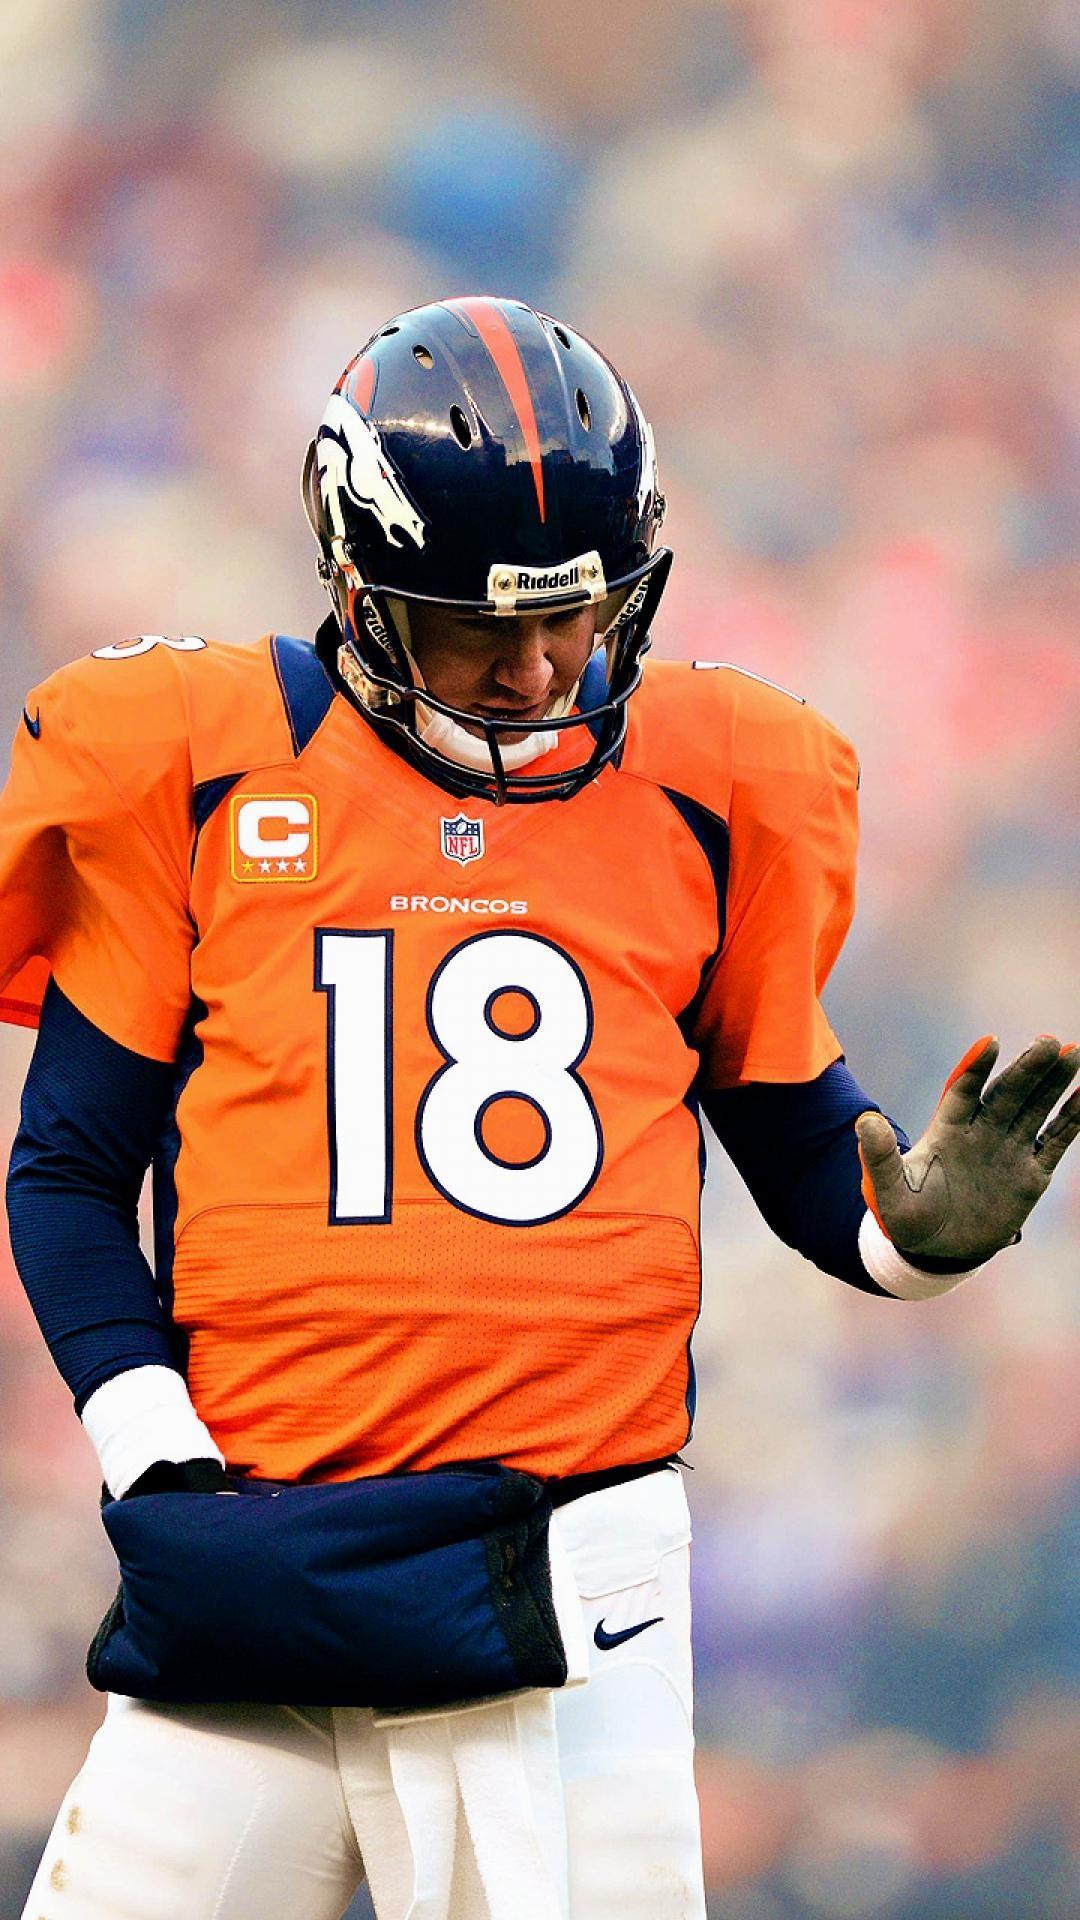 wallpaper.wiki-Denver-Broncos-iPhone-5-Full-HD-